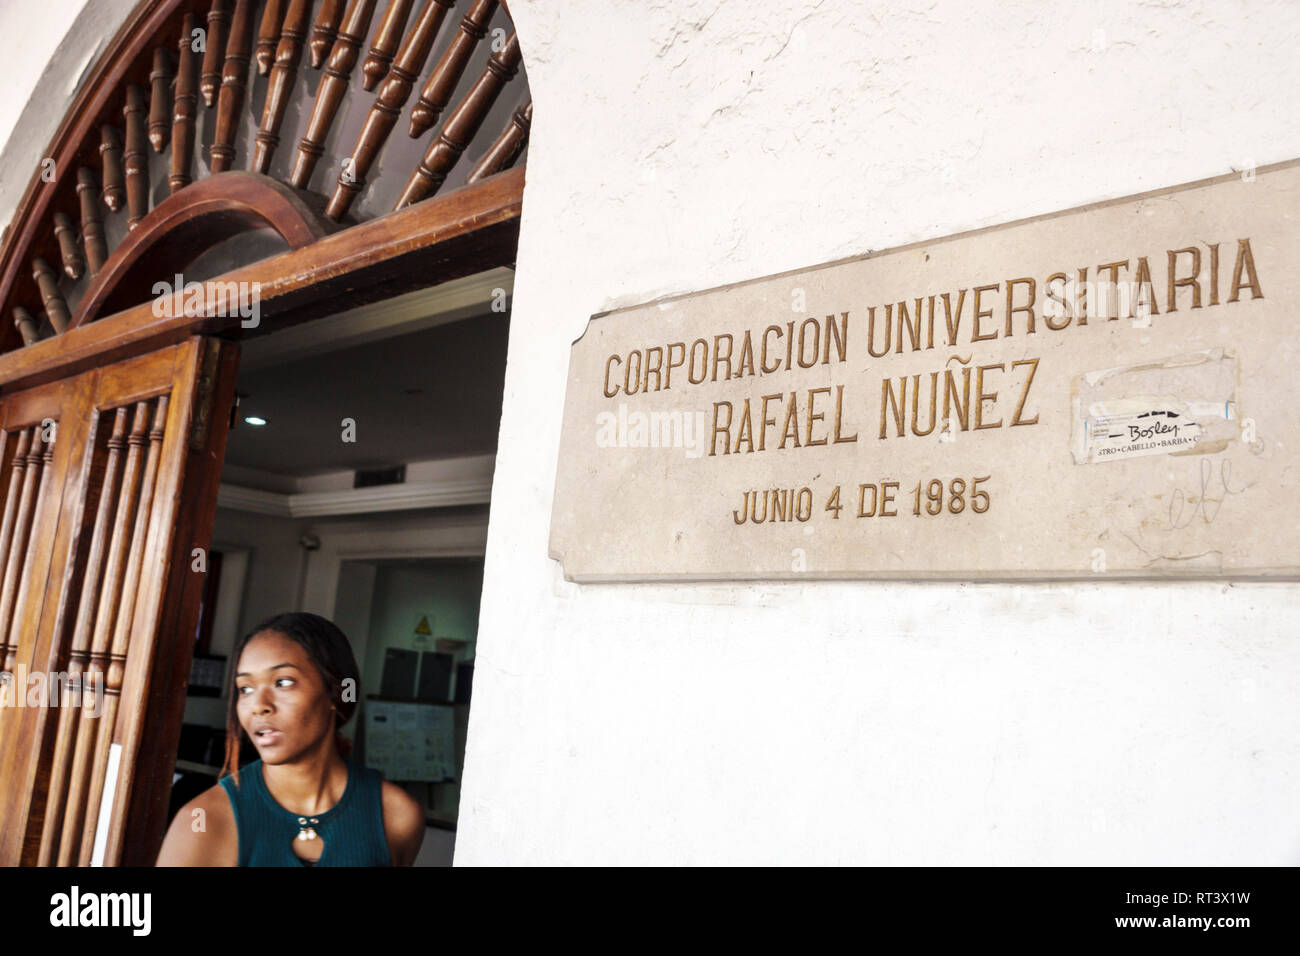 Cartagena Colombia ciudad amurallada vieja Centro Centro Hispanic Corporación Universitaria Rafael Núñez residentes Residente estudiante universitario educ superior Imagen De Stock